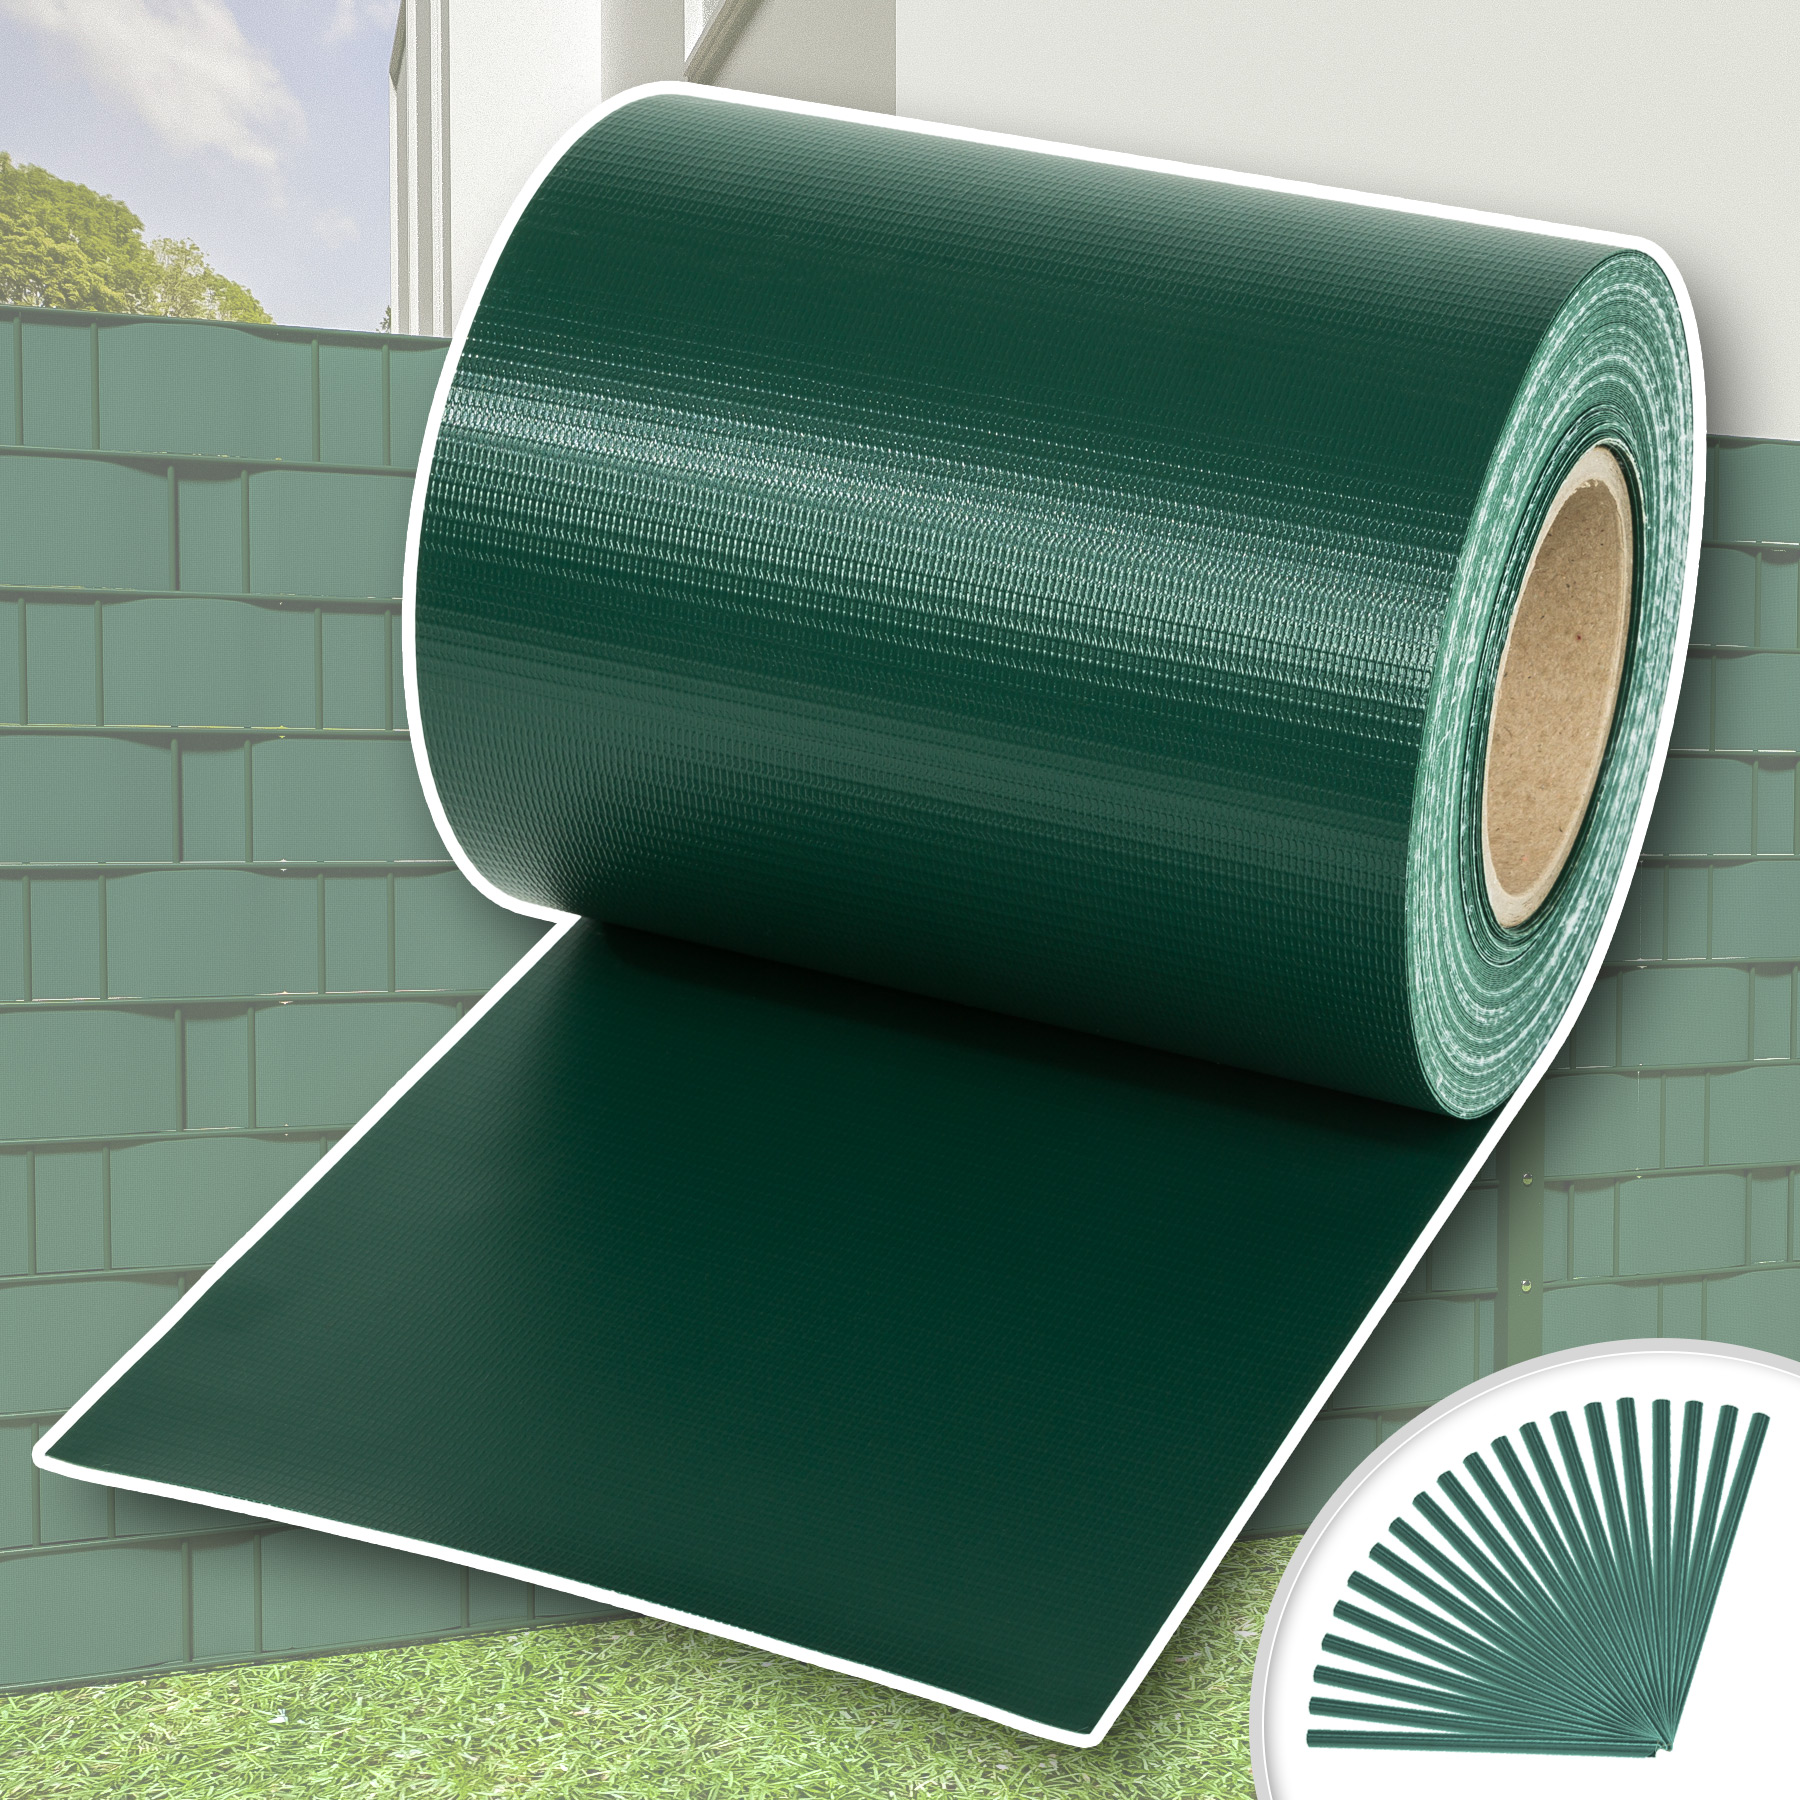 Rollo aislamiento aislante PVC 35m x 19cm jardín para vallas banda ...